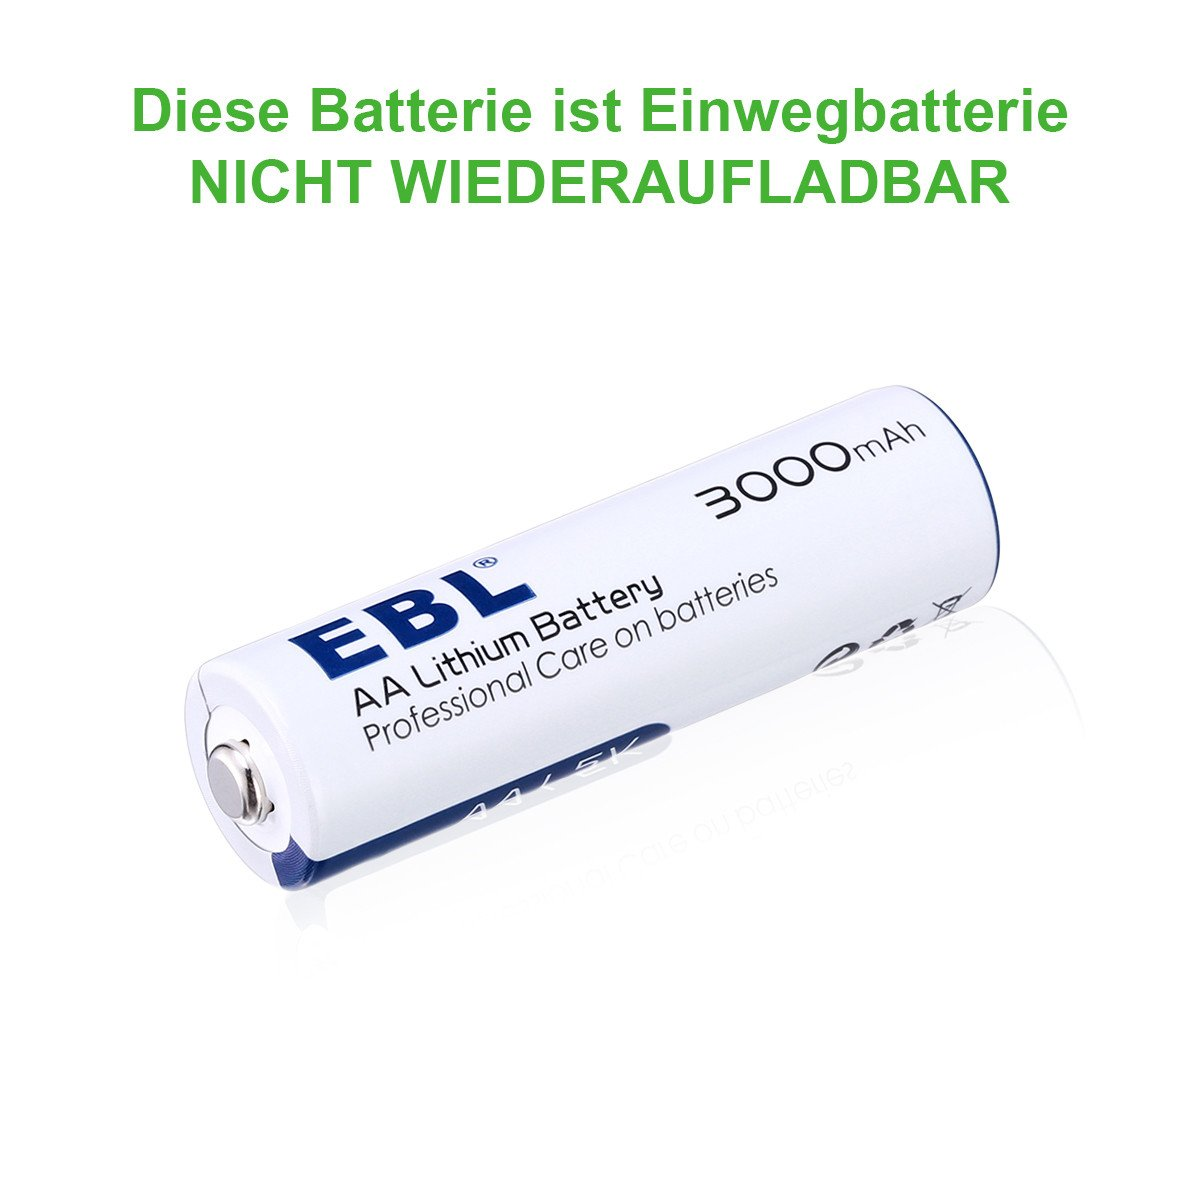 EBL 8 Stück AA Lithium Batterie 1.5V 3000mAh sofort einsatzbereit